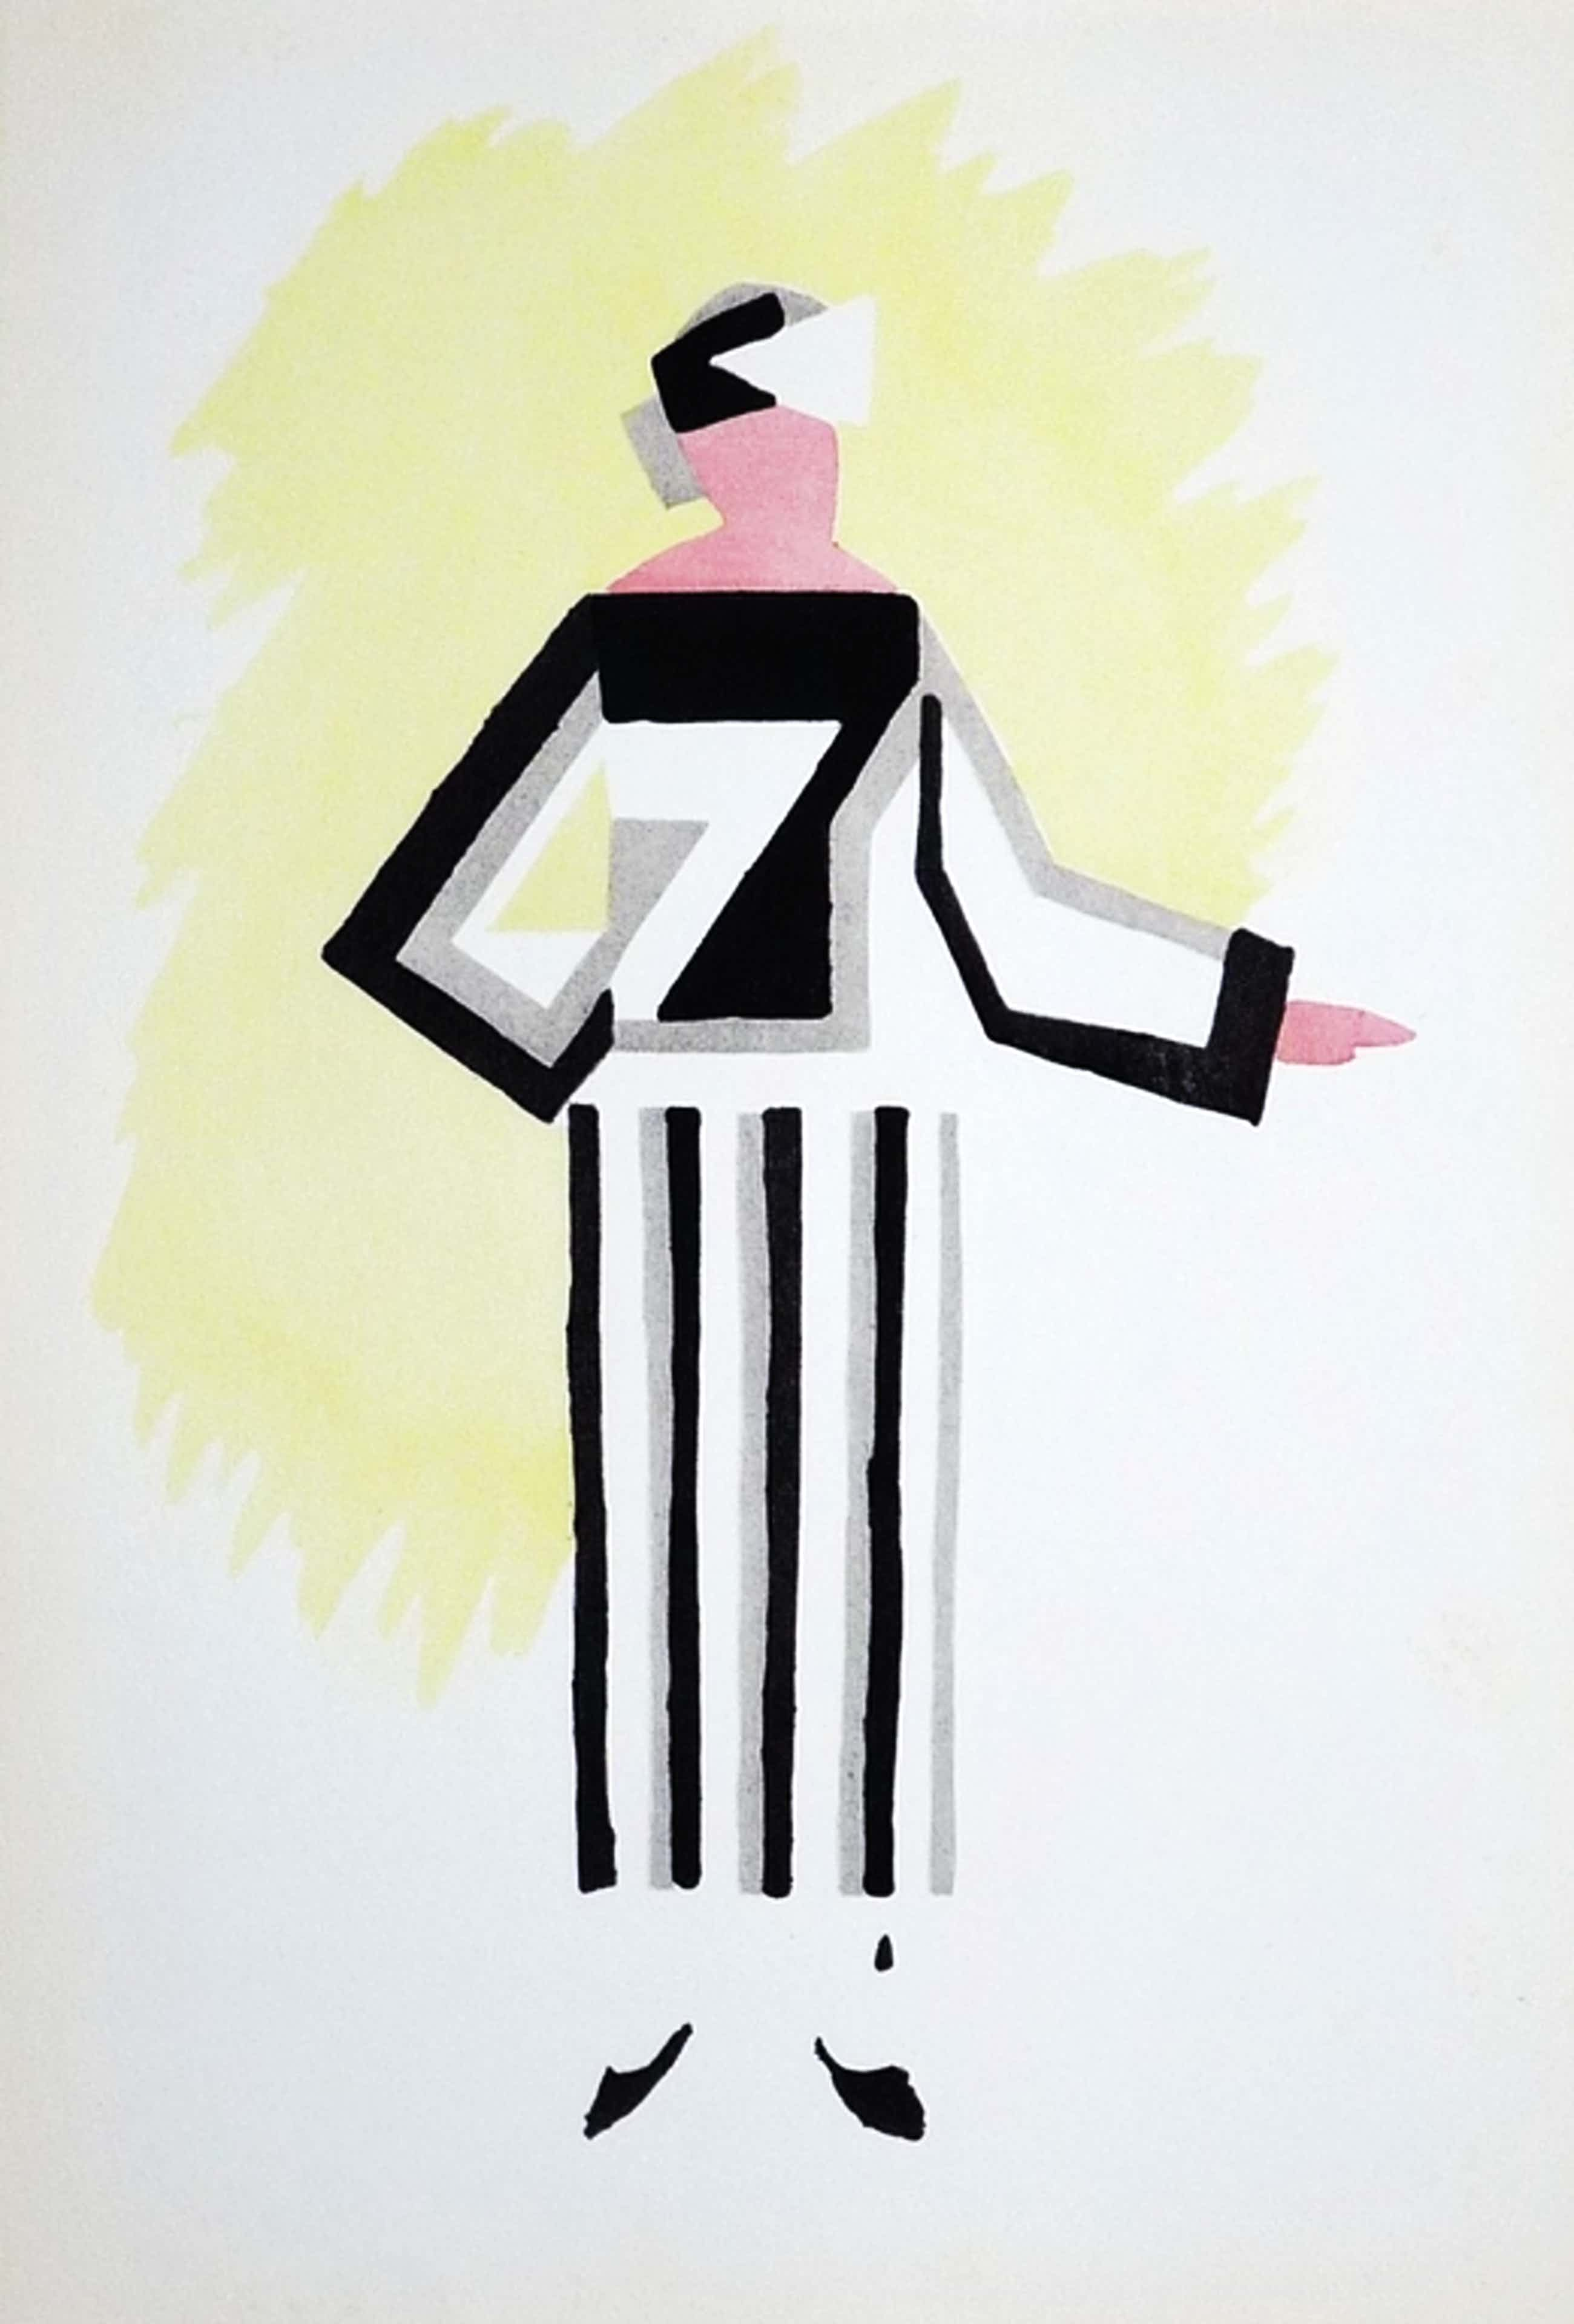 Sonia Delaunay, Pochoir uit Tableaux Vivants kopen? Bied vanaf 65!